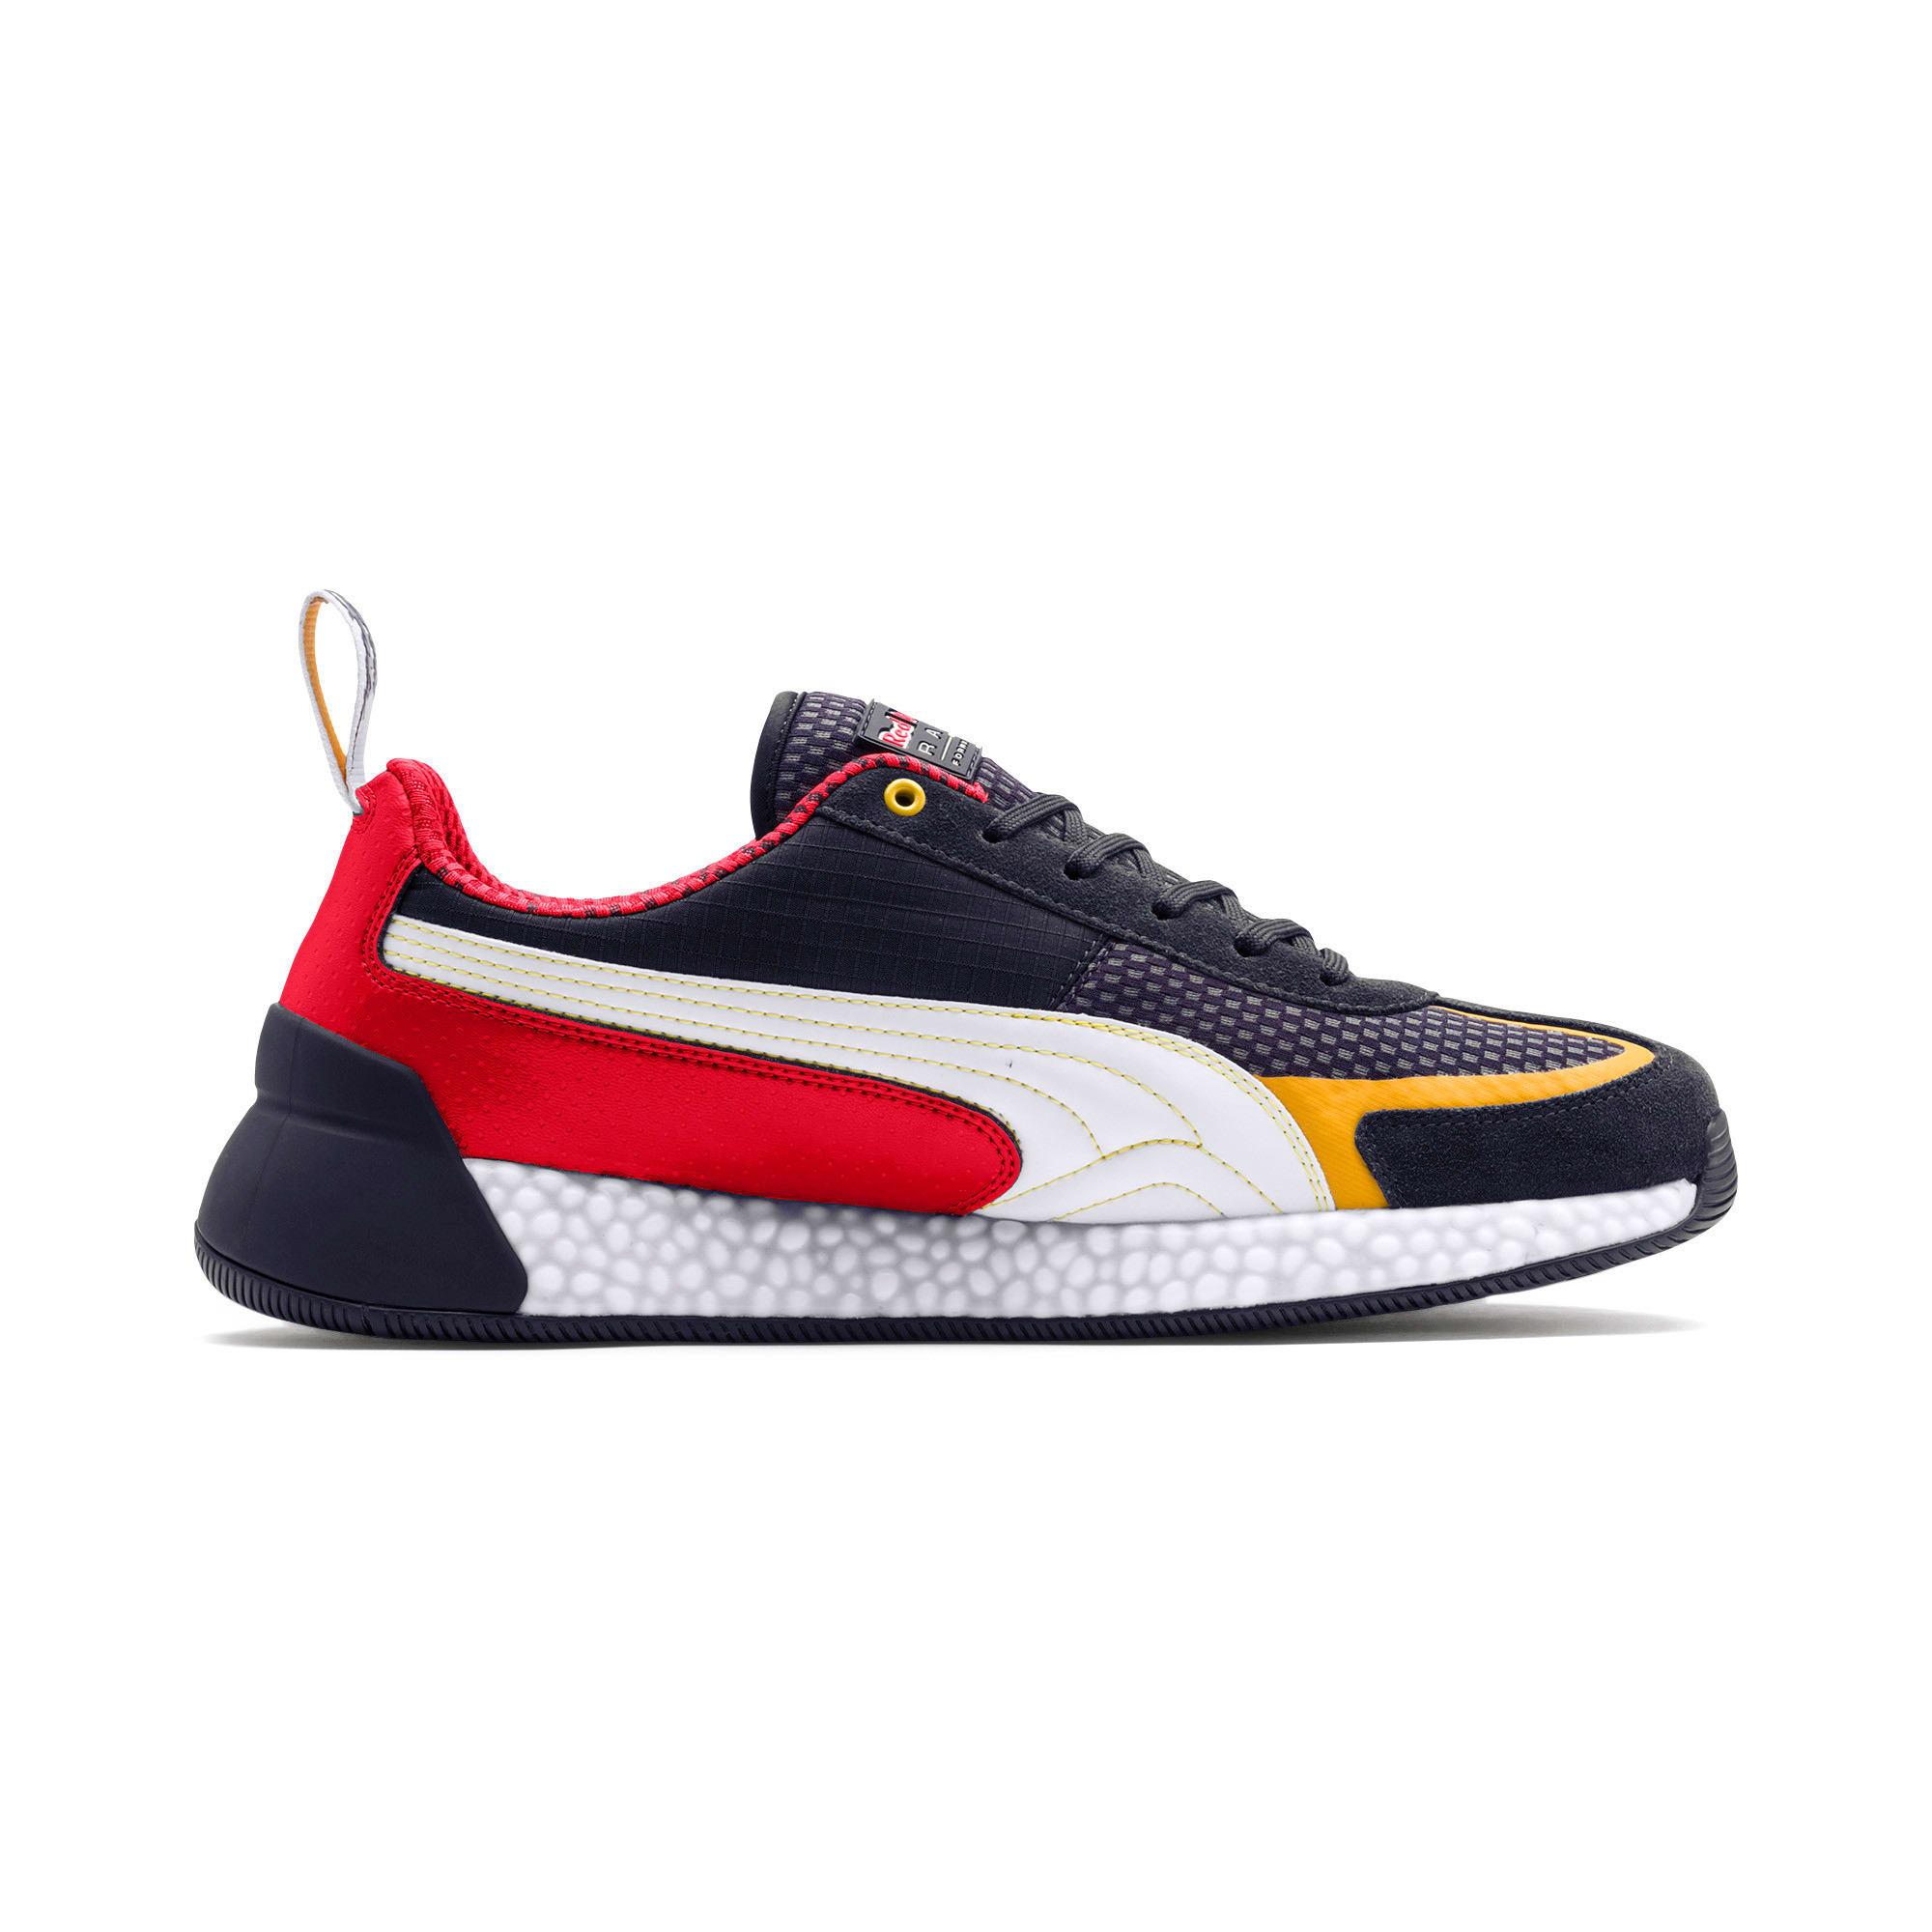 Thumbnail 6 of Red Bull Racing Speed HYBRID sneakers voor heren, NIGHT SKY-White-Chinese Red, medium